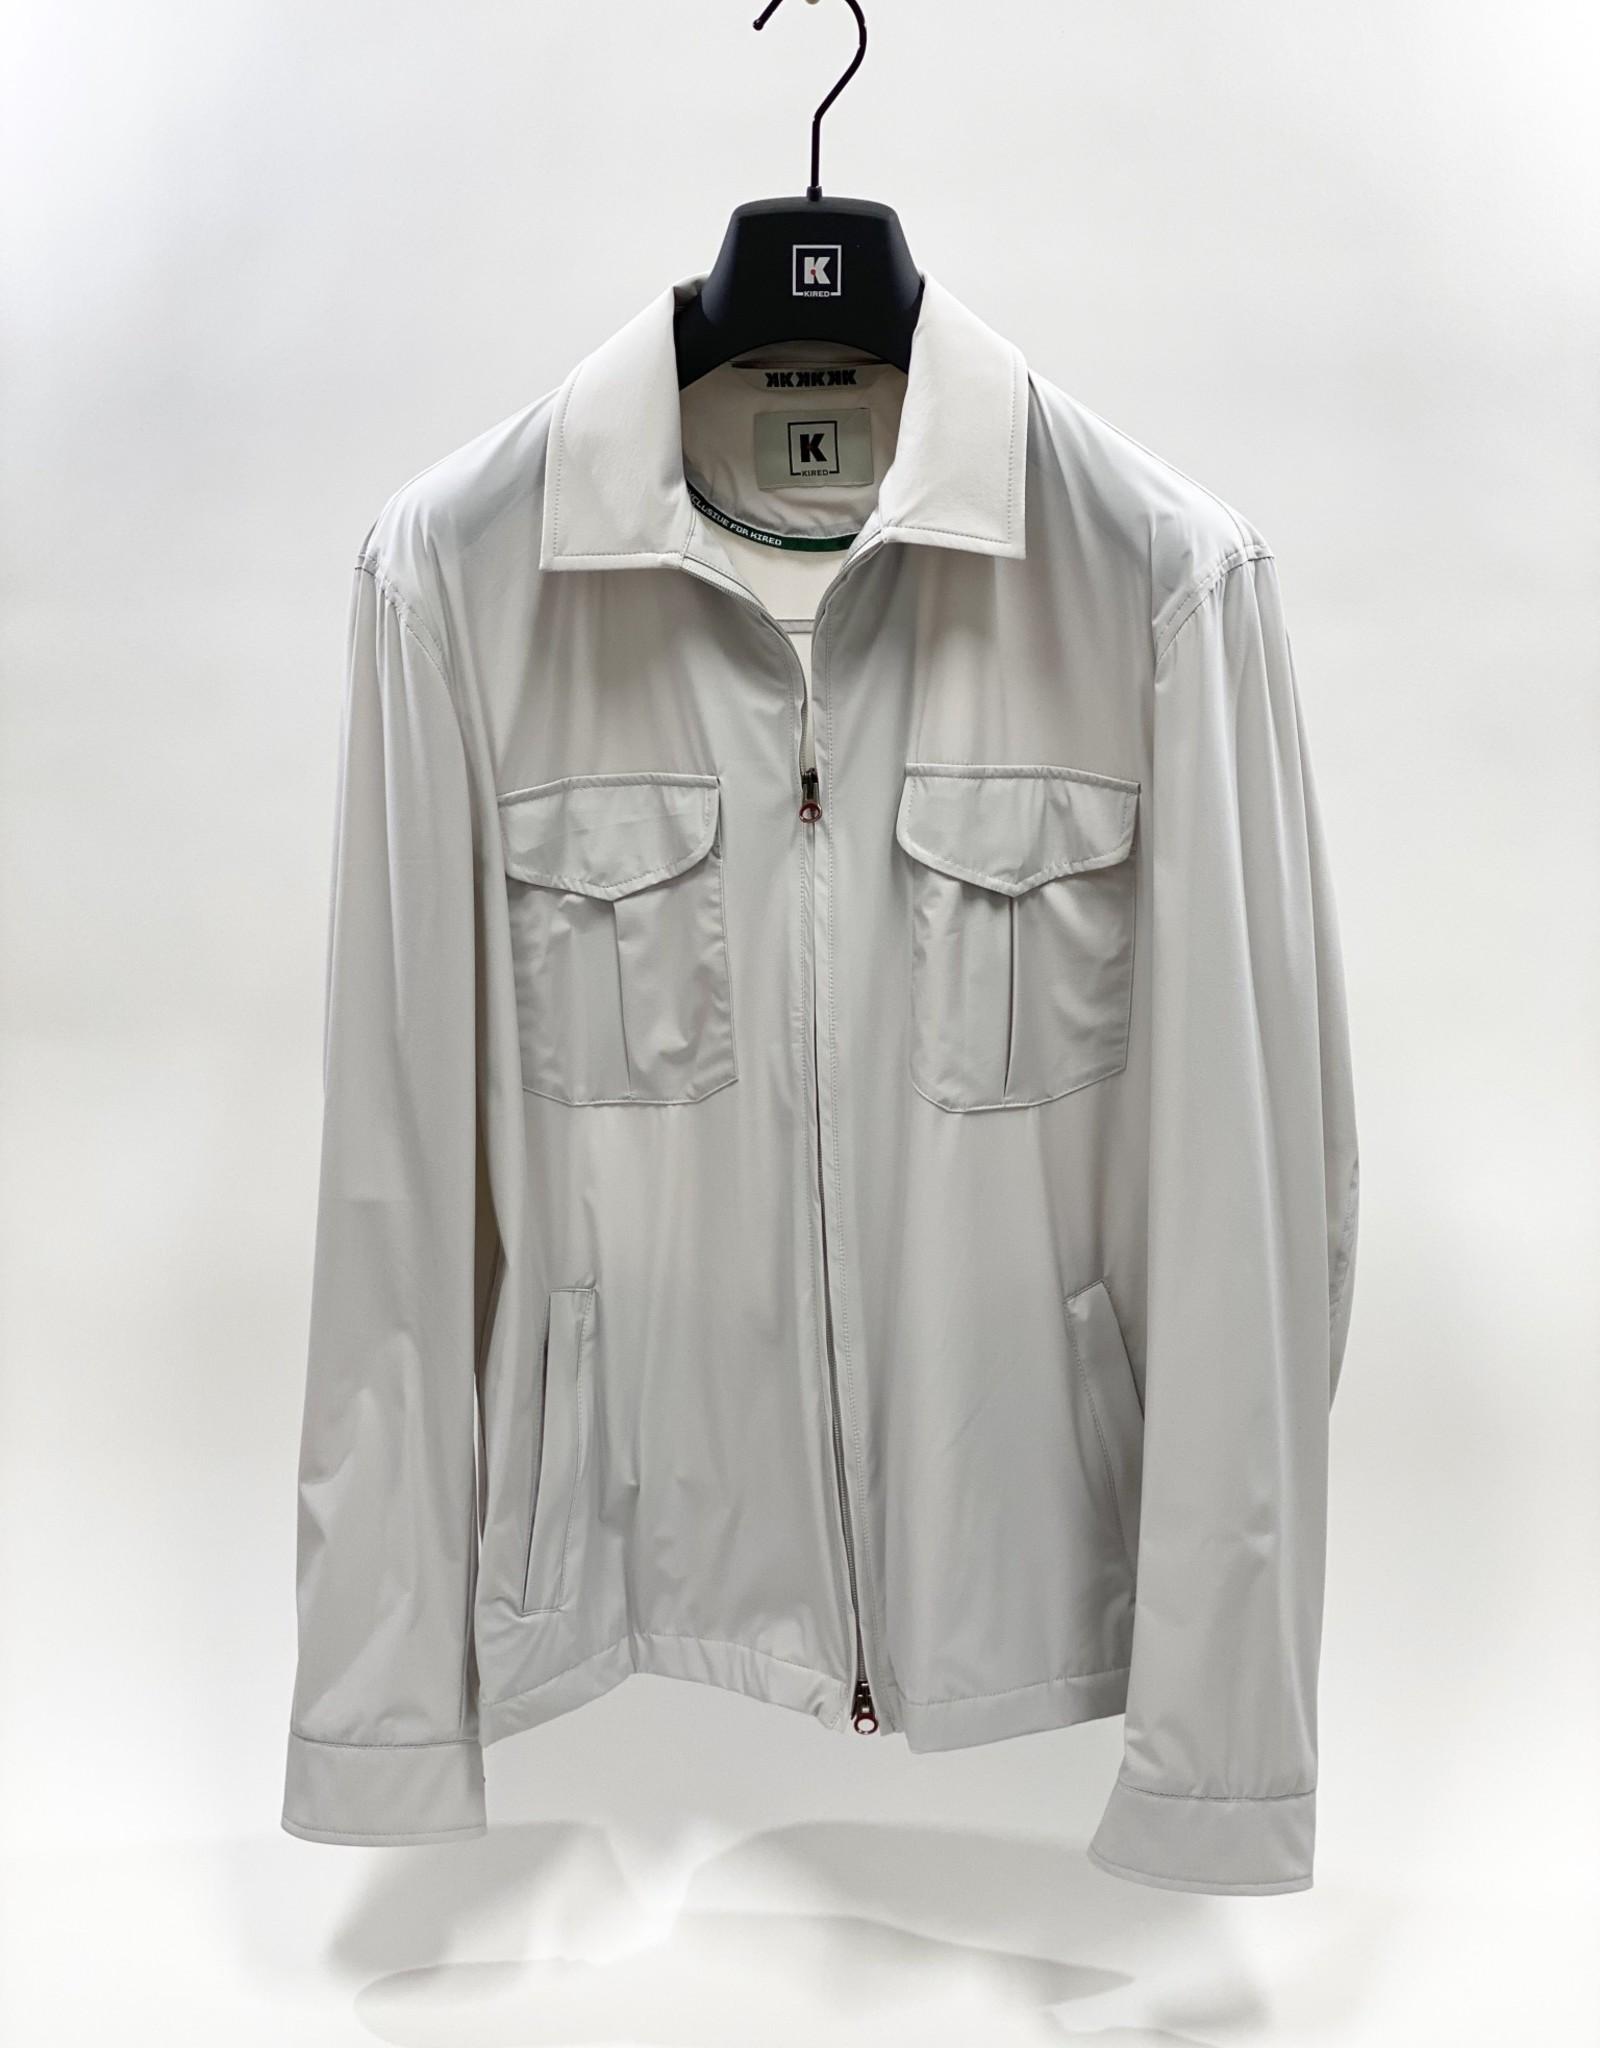 Kired Shirt Jacket